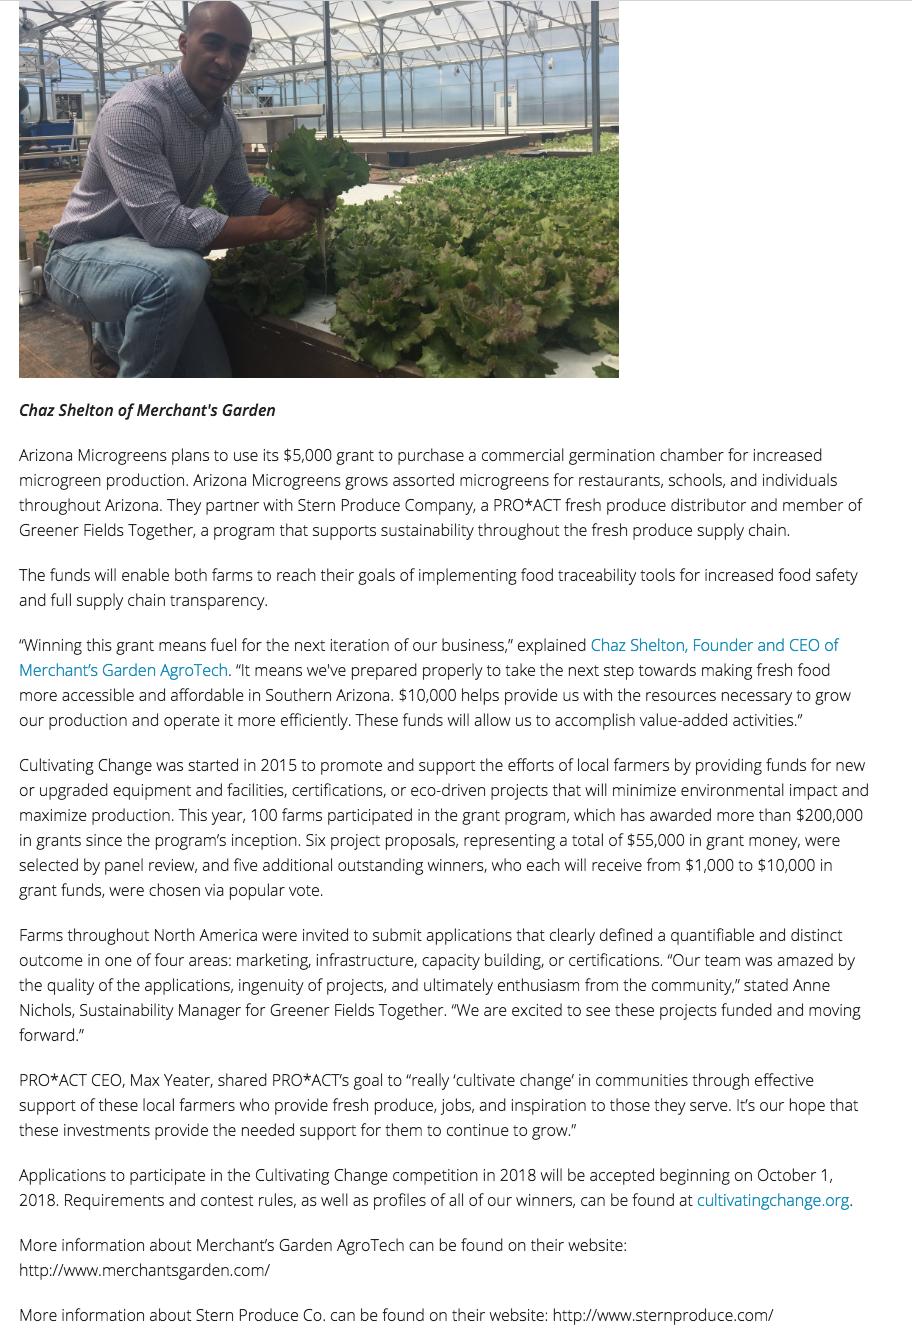 Https://www.azfb.org/Article/Two Arizona Urban Farmers Win National Grants